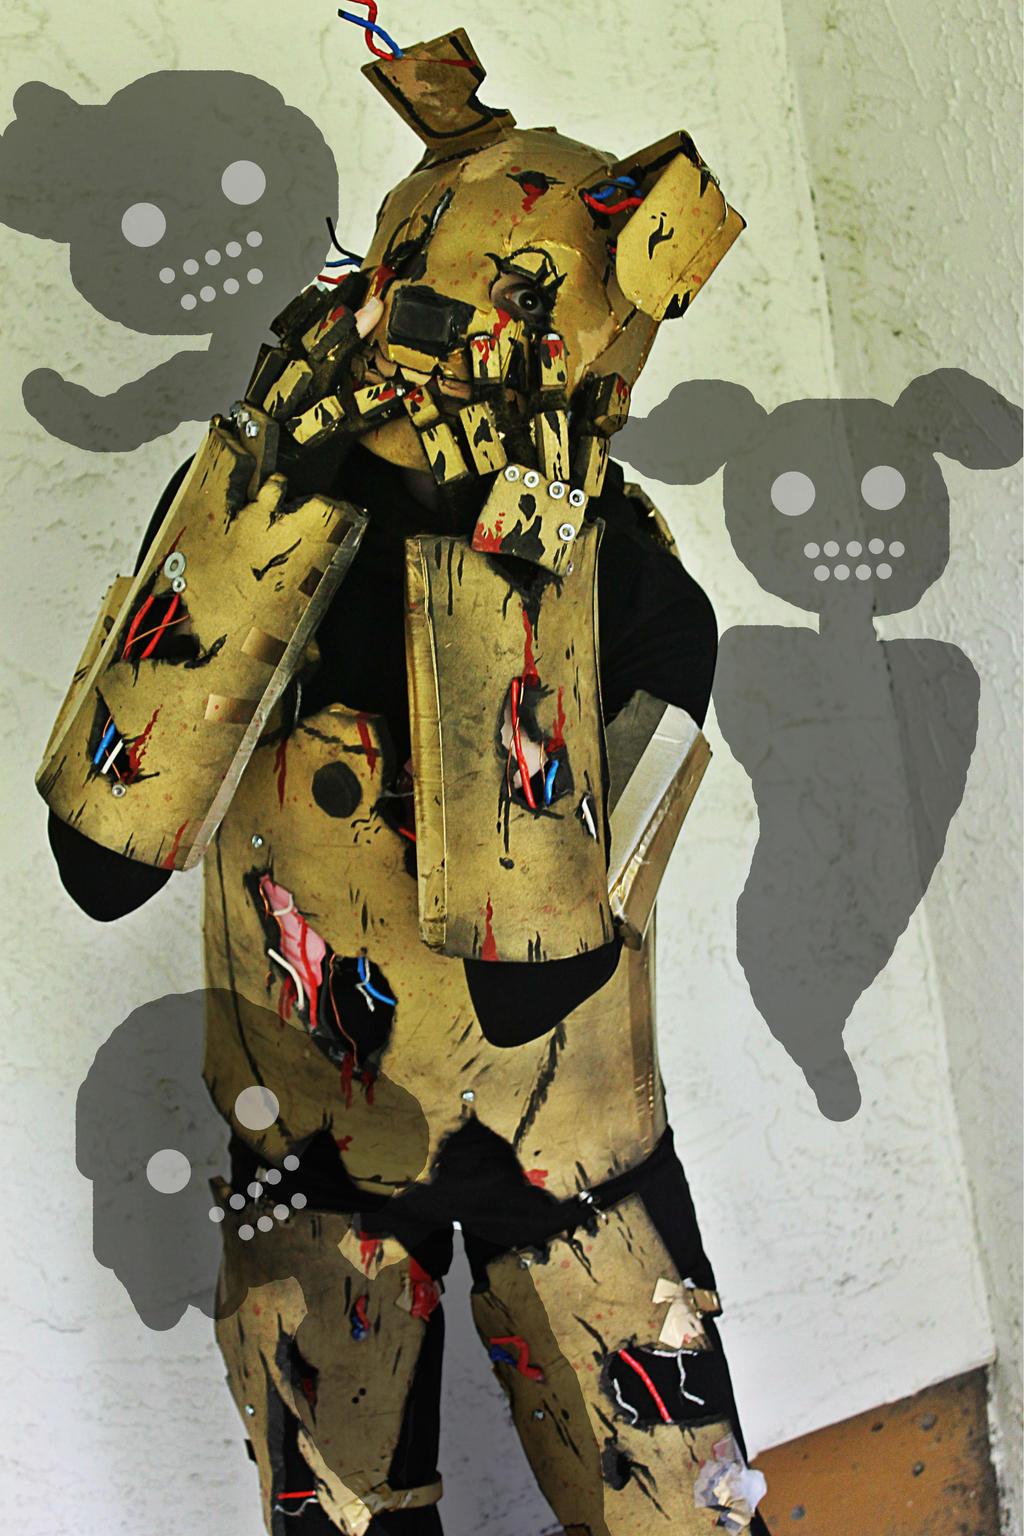 Goodnight springtrap fnaf 3 springtrap cosplay by fandomartistalley